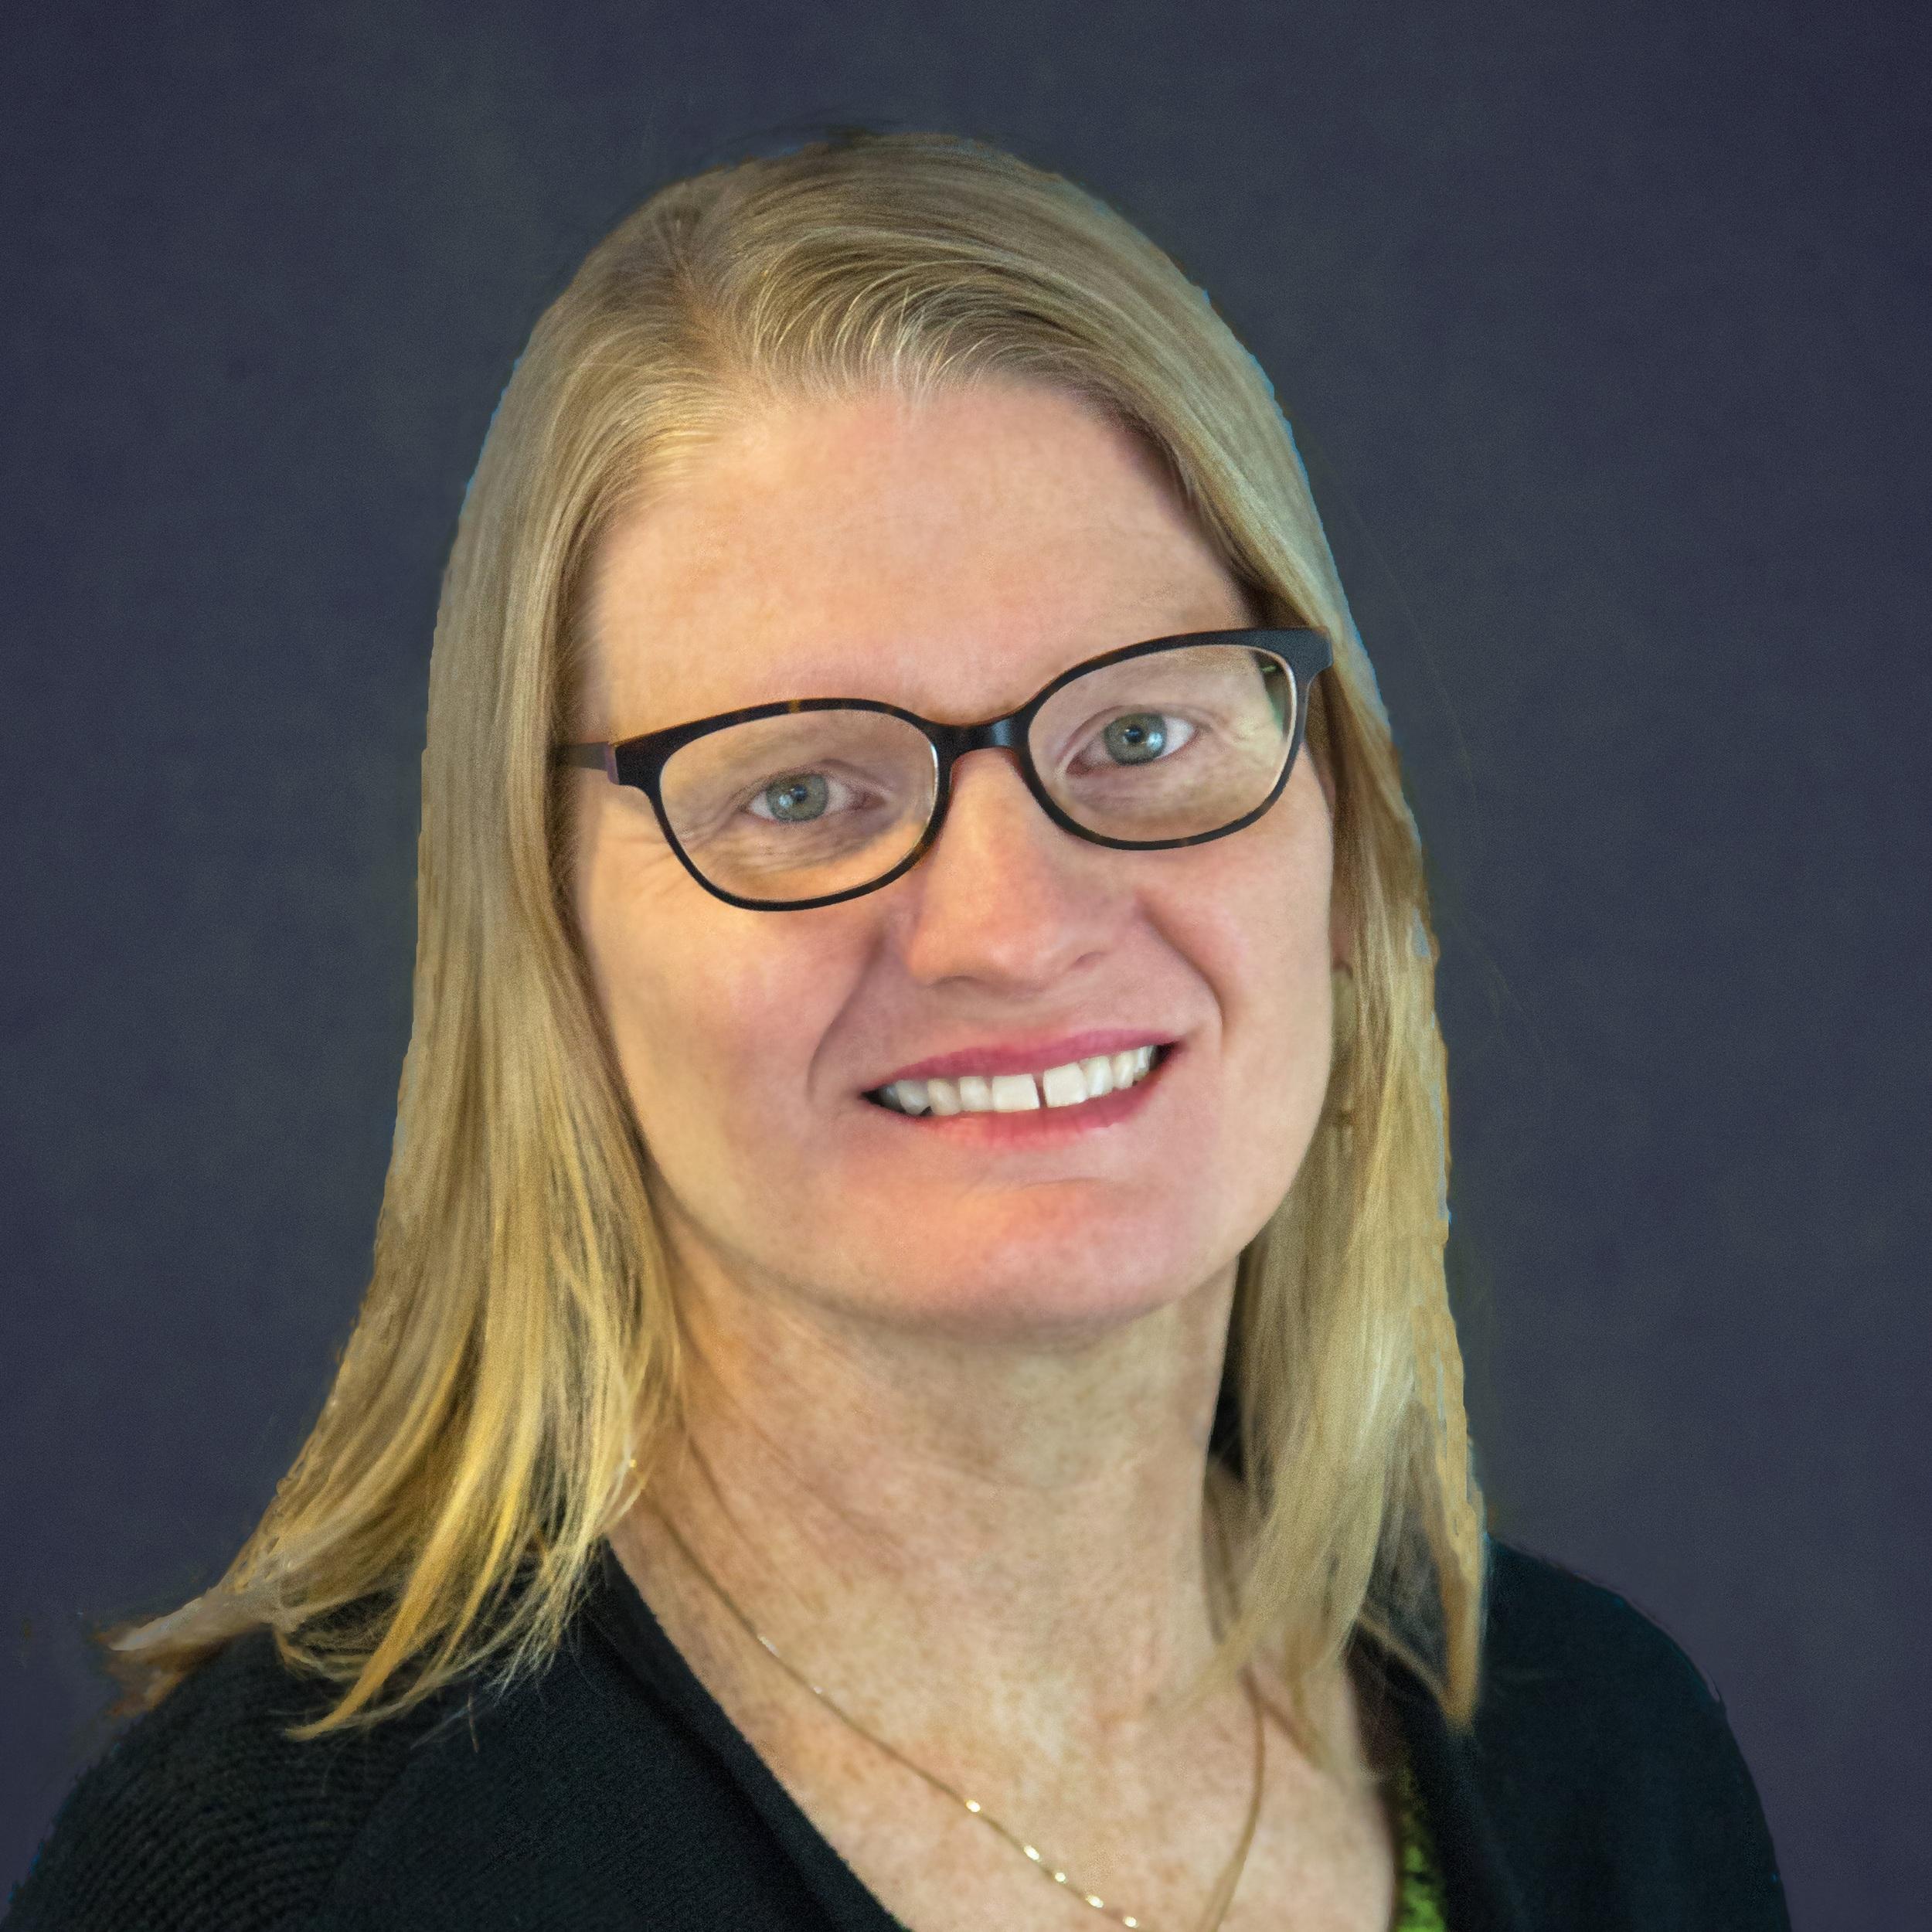 Kirsten Cruikshank - Eldercare Development Partnership (EDP) Program Coordinator218.529.7537